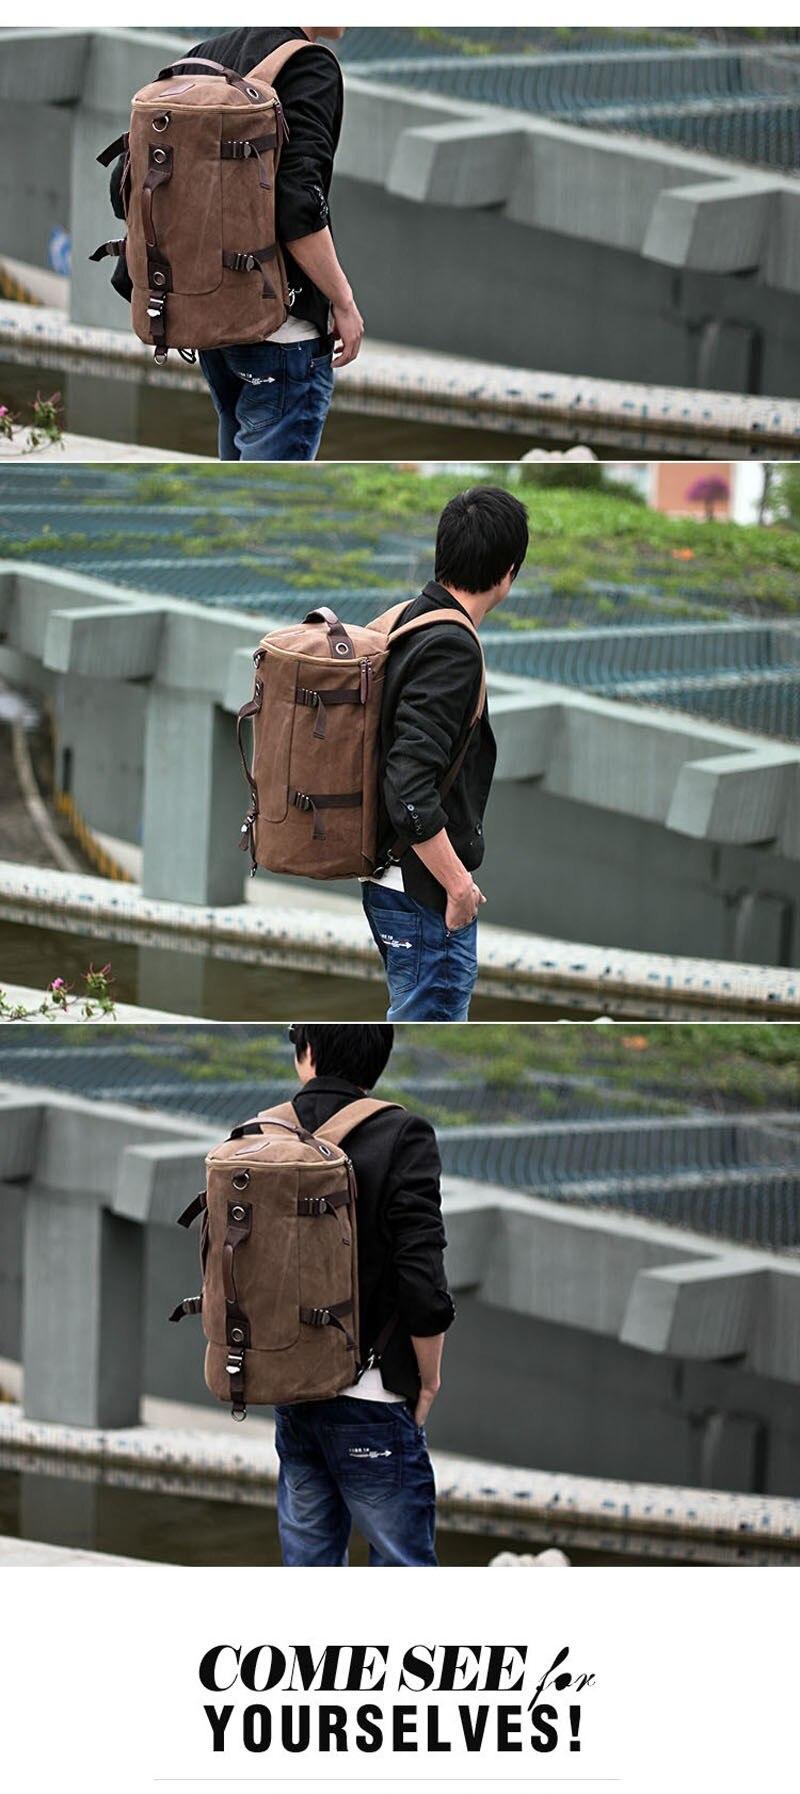 Men's Multi-Functional Backpack Vintage Shoulder Bag High Quality Canvas Male Bagpack Rucksack Travel Luggage for Weekend 38